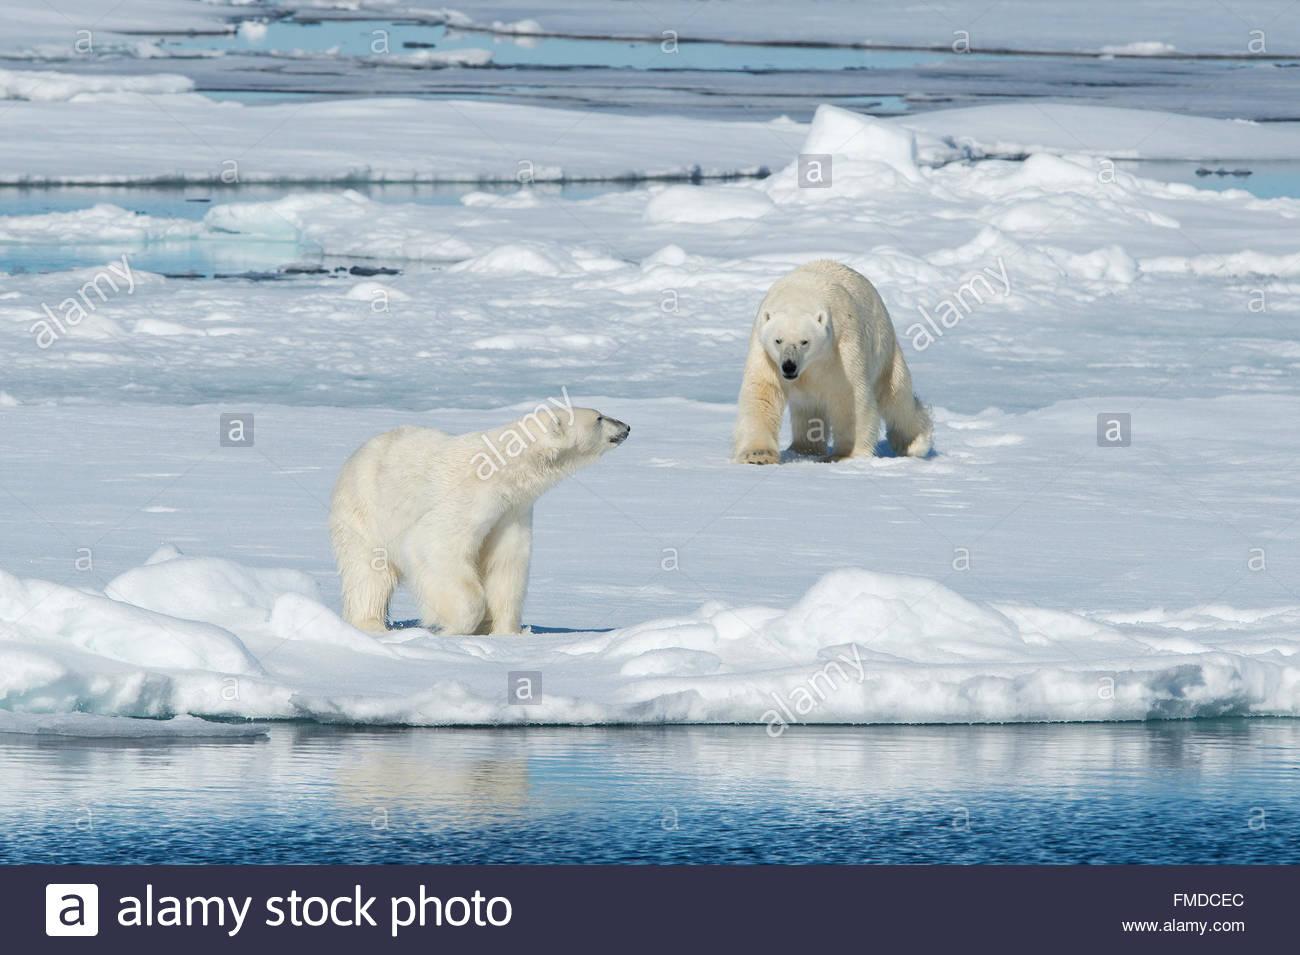 Two Polar bears Ursus Maritimus 'Thalarctos Maritimus' meet on an ice floe, Svalbard, Norway. - Stock Image